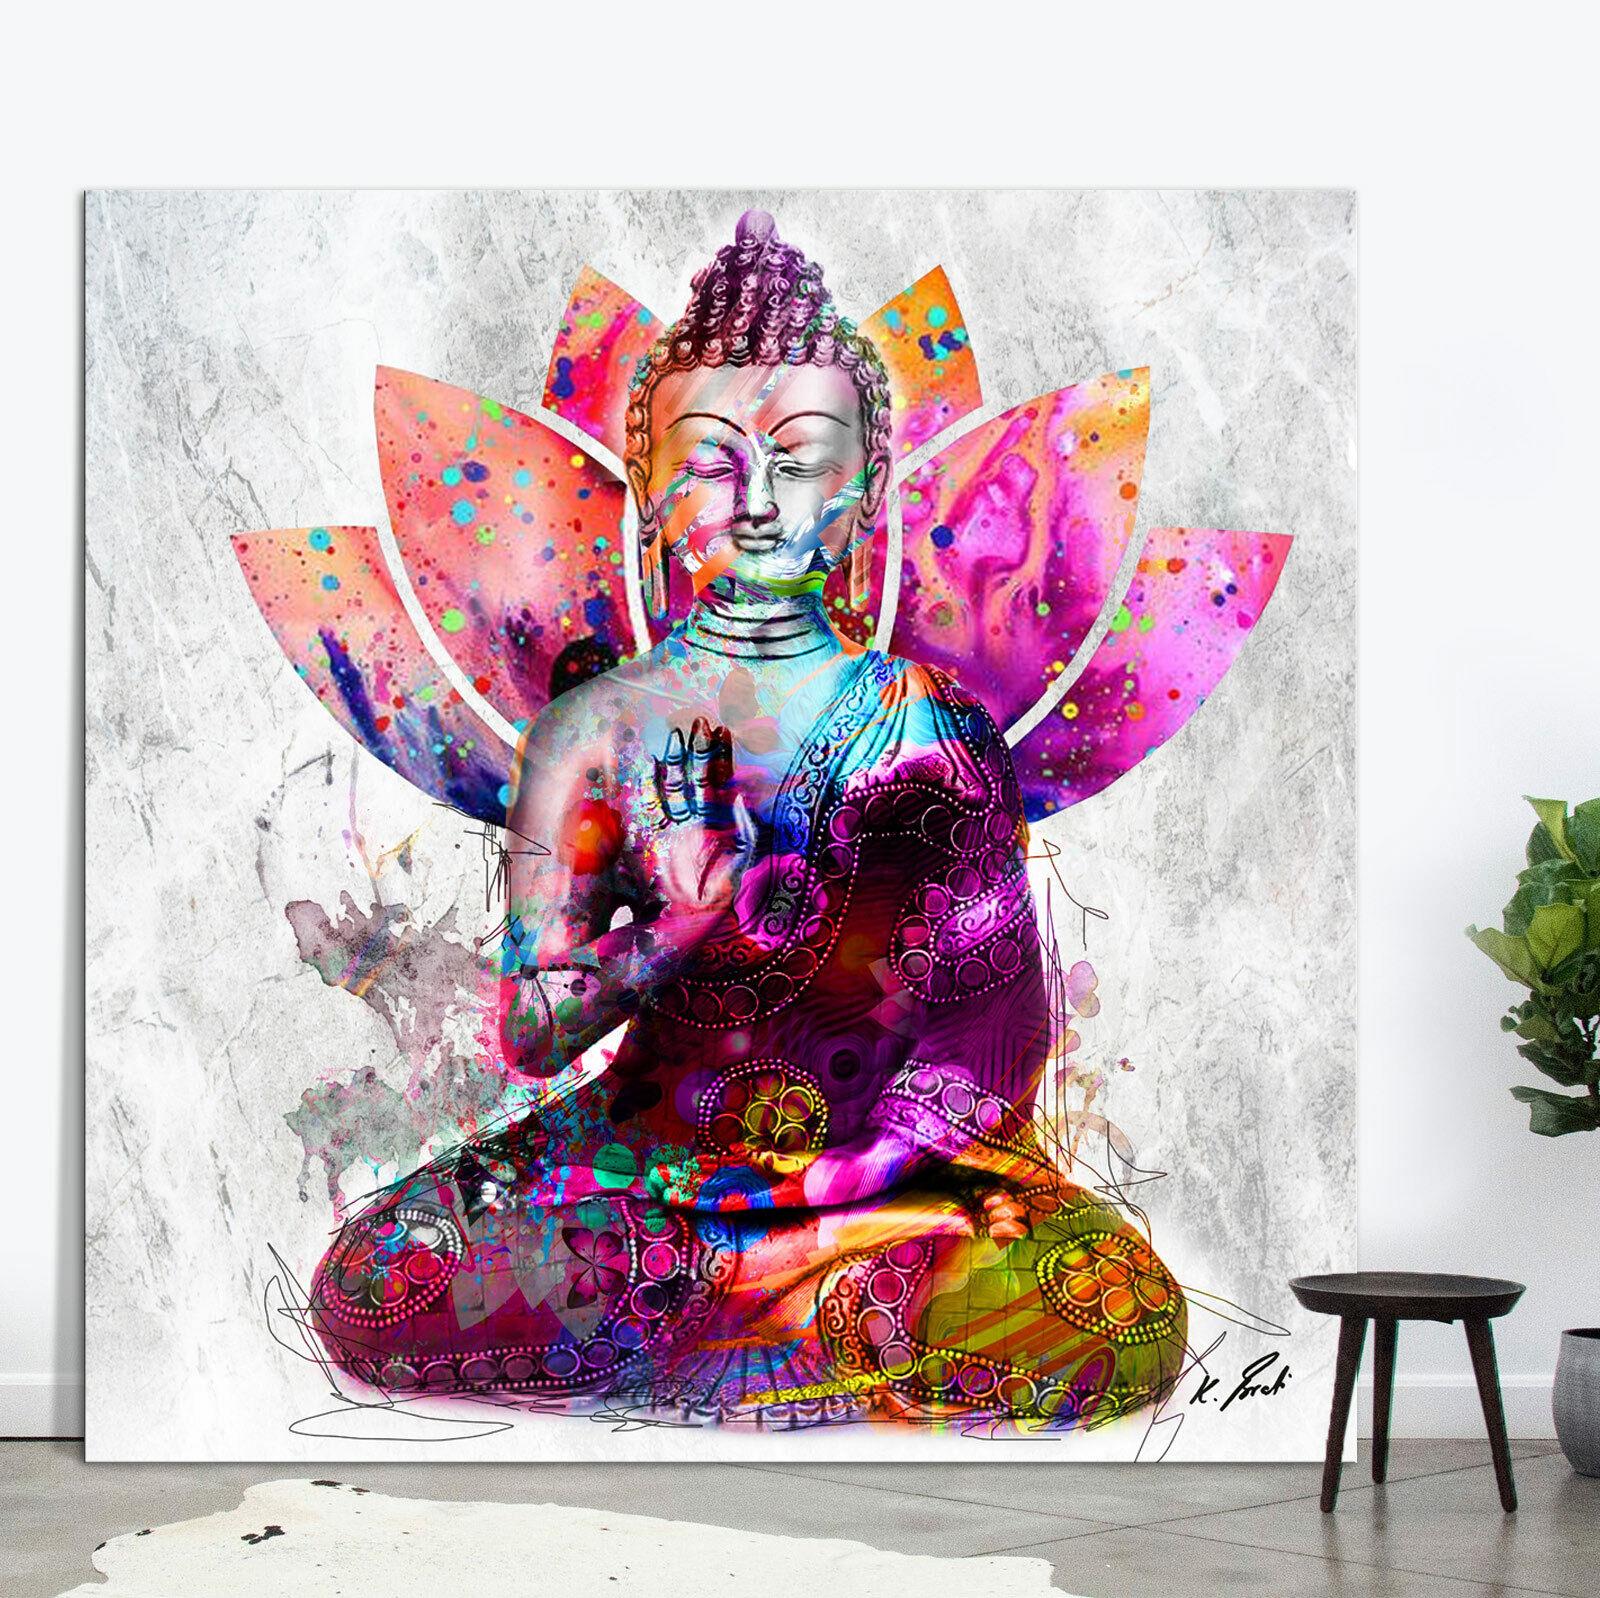 Buddha Bild Bunt Farbe Leinwand Abstrakte Kunst Bilder Wandbilder D1858